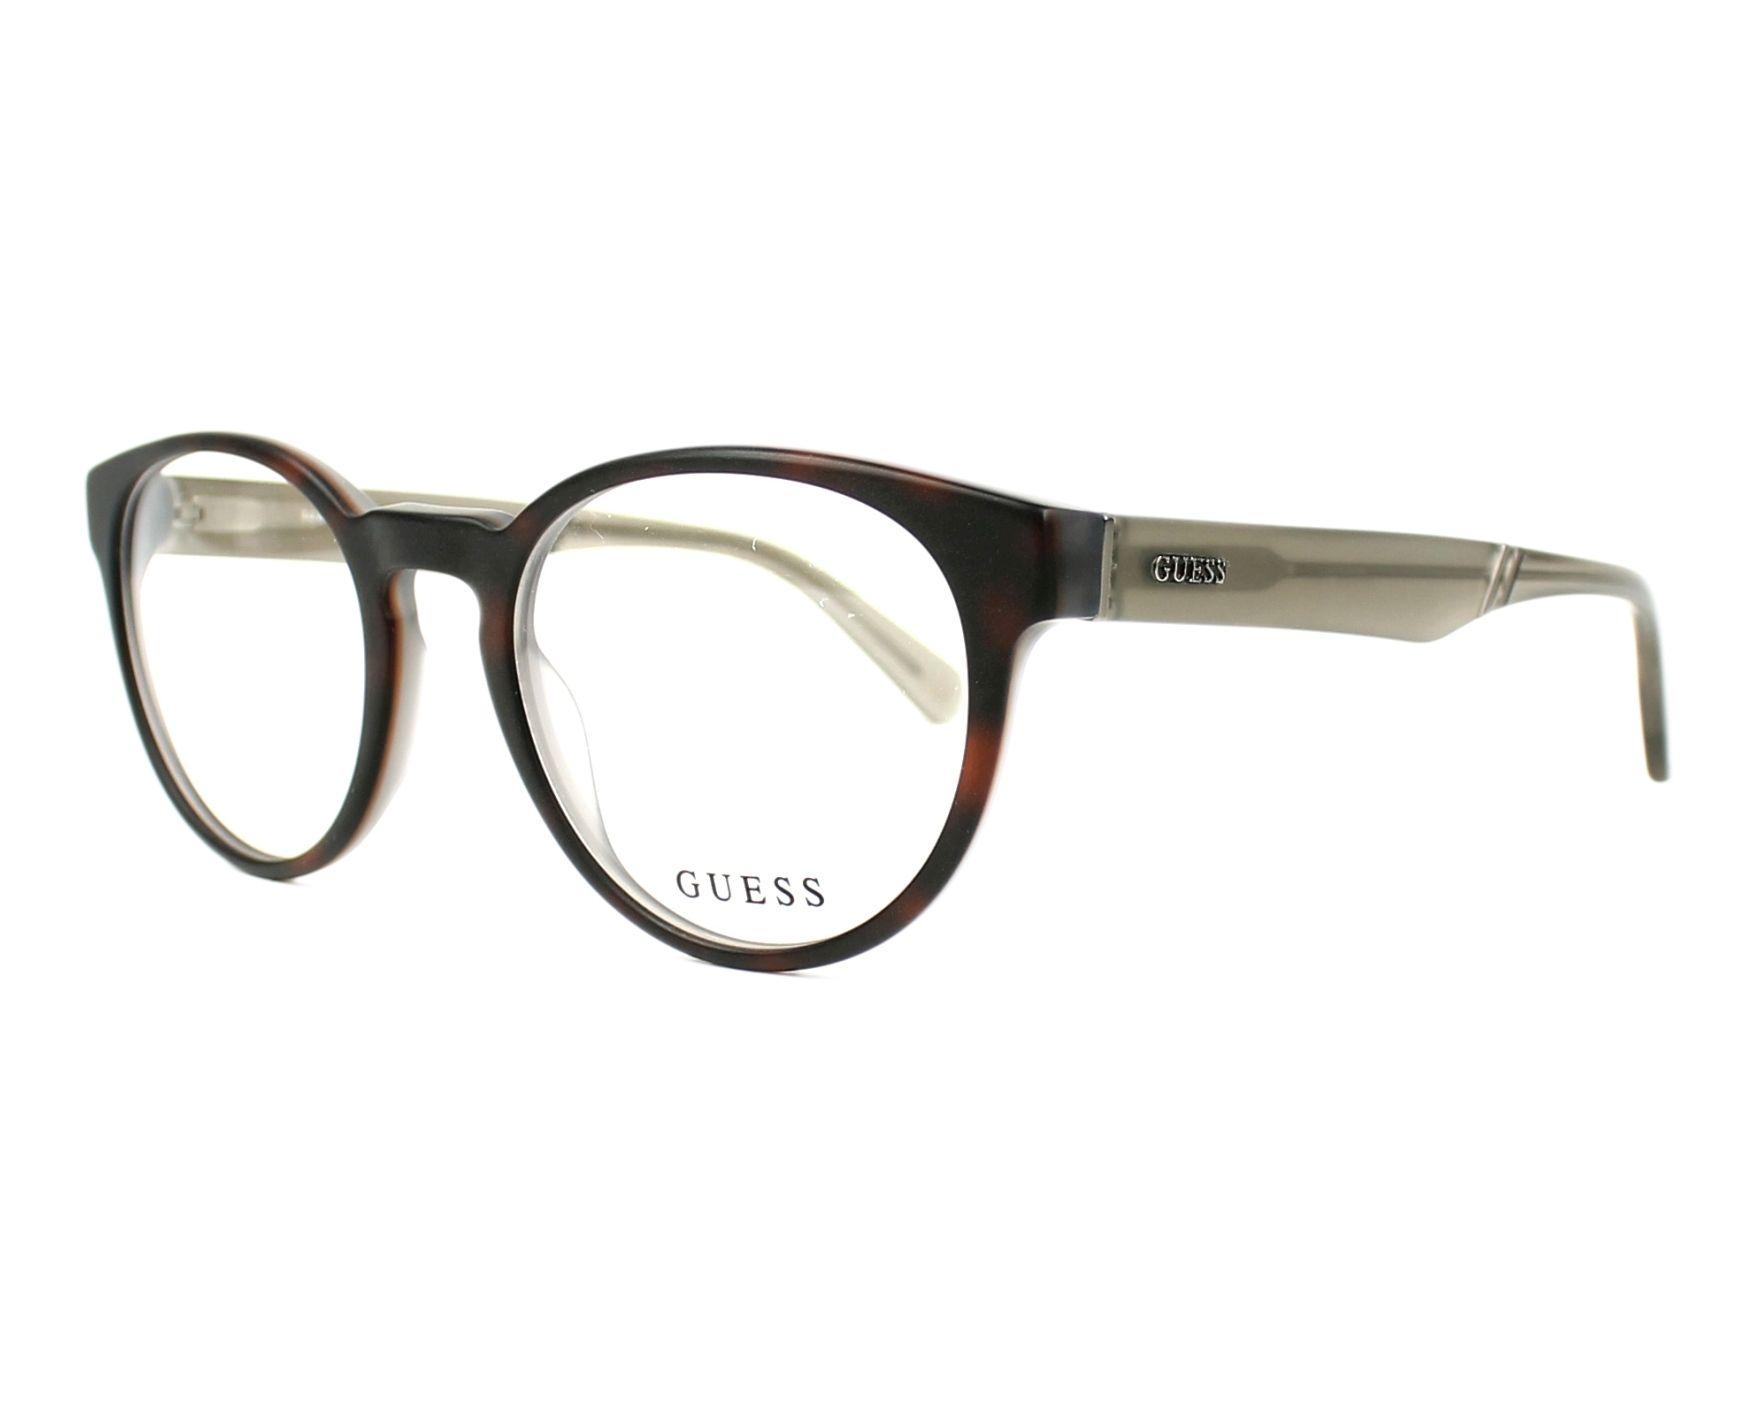 Guess Eyeglasses GU-1932 052 Havana | visio-net.com